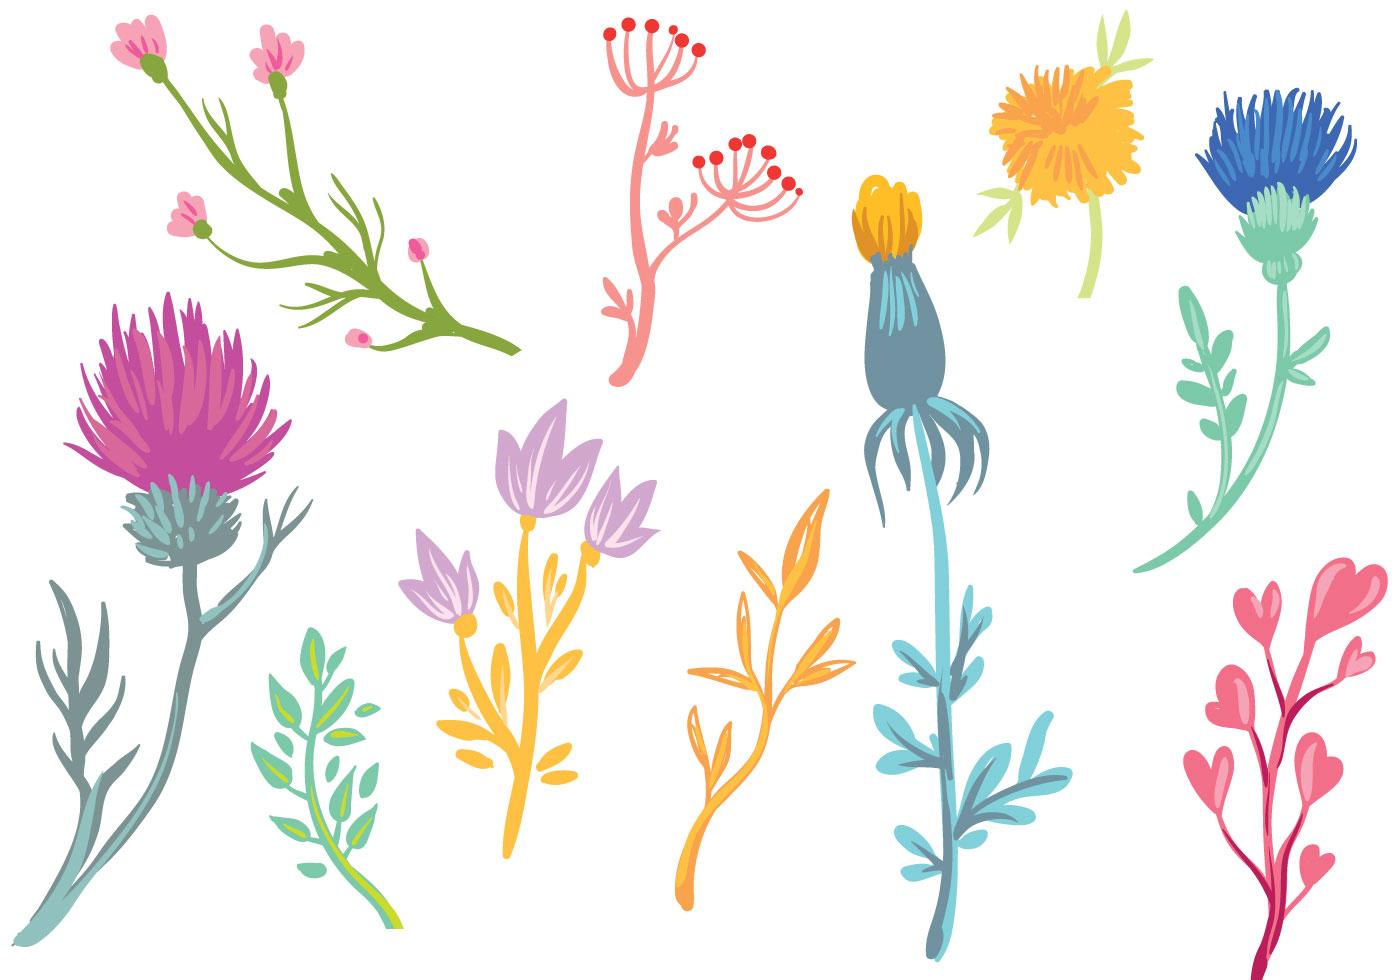 Wildflowers Free Vector Art - (8072 Free Downloads)